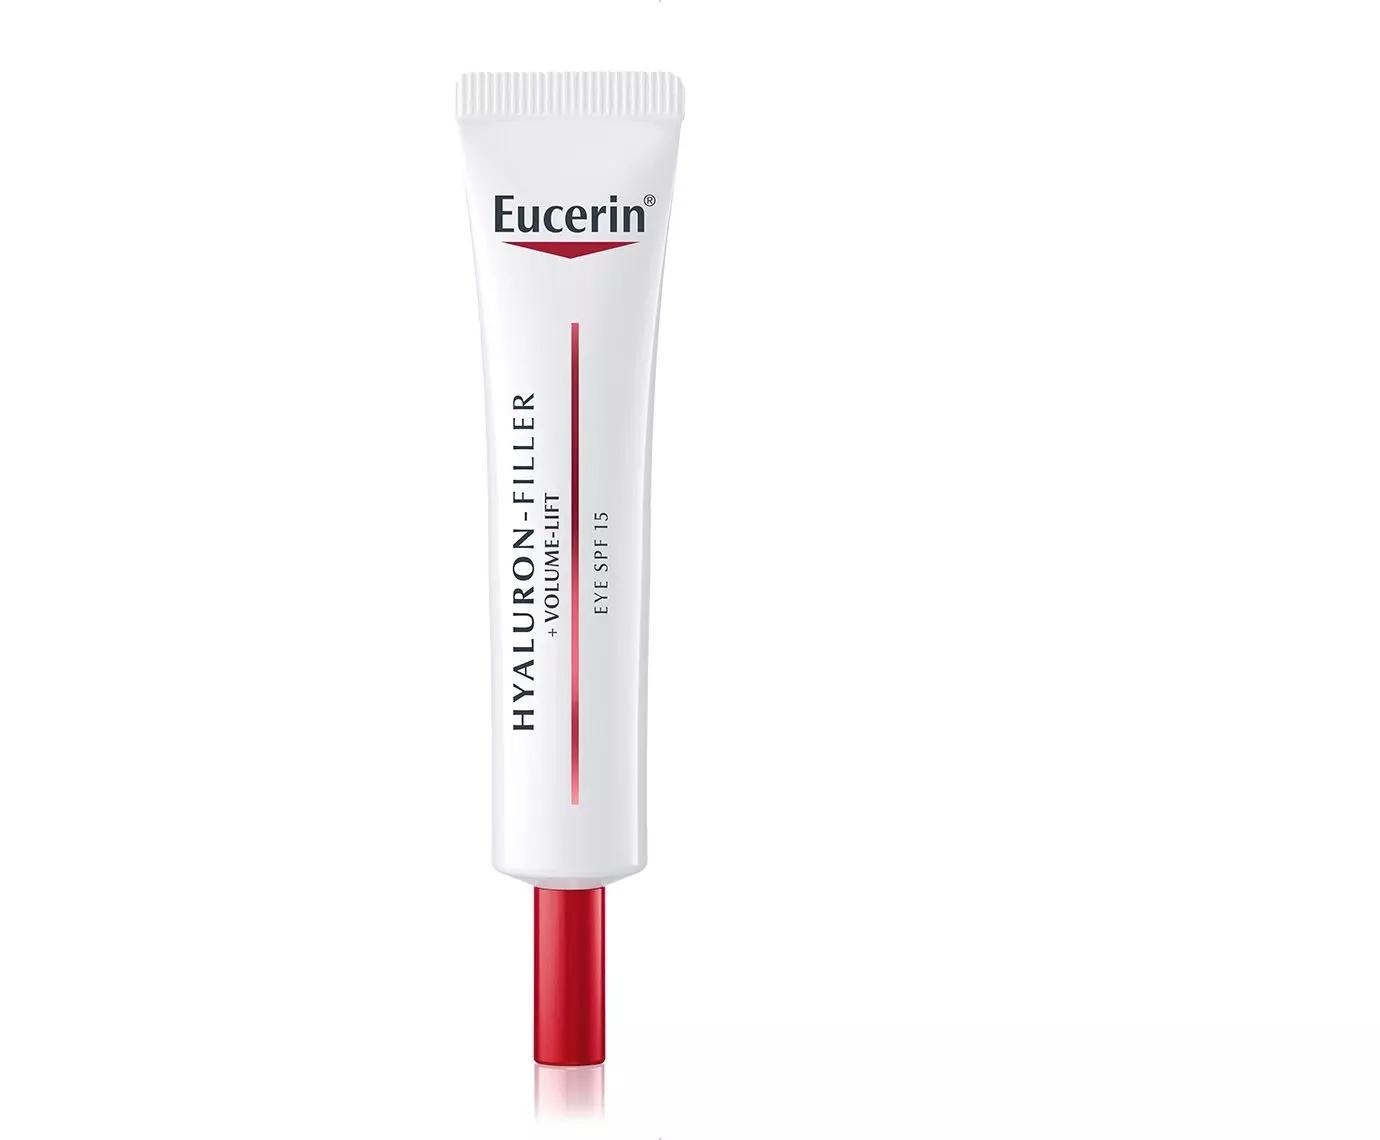 Eucerin Hialuron Filler + Volume Lift Eye Care SPF 15